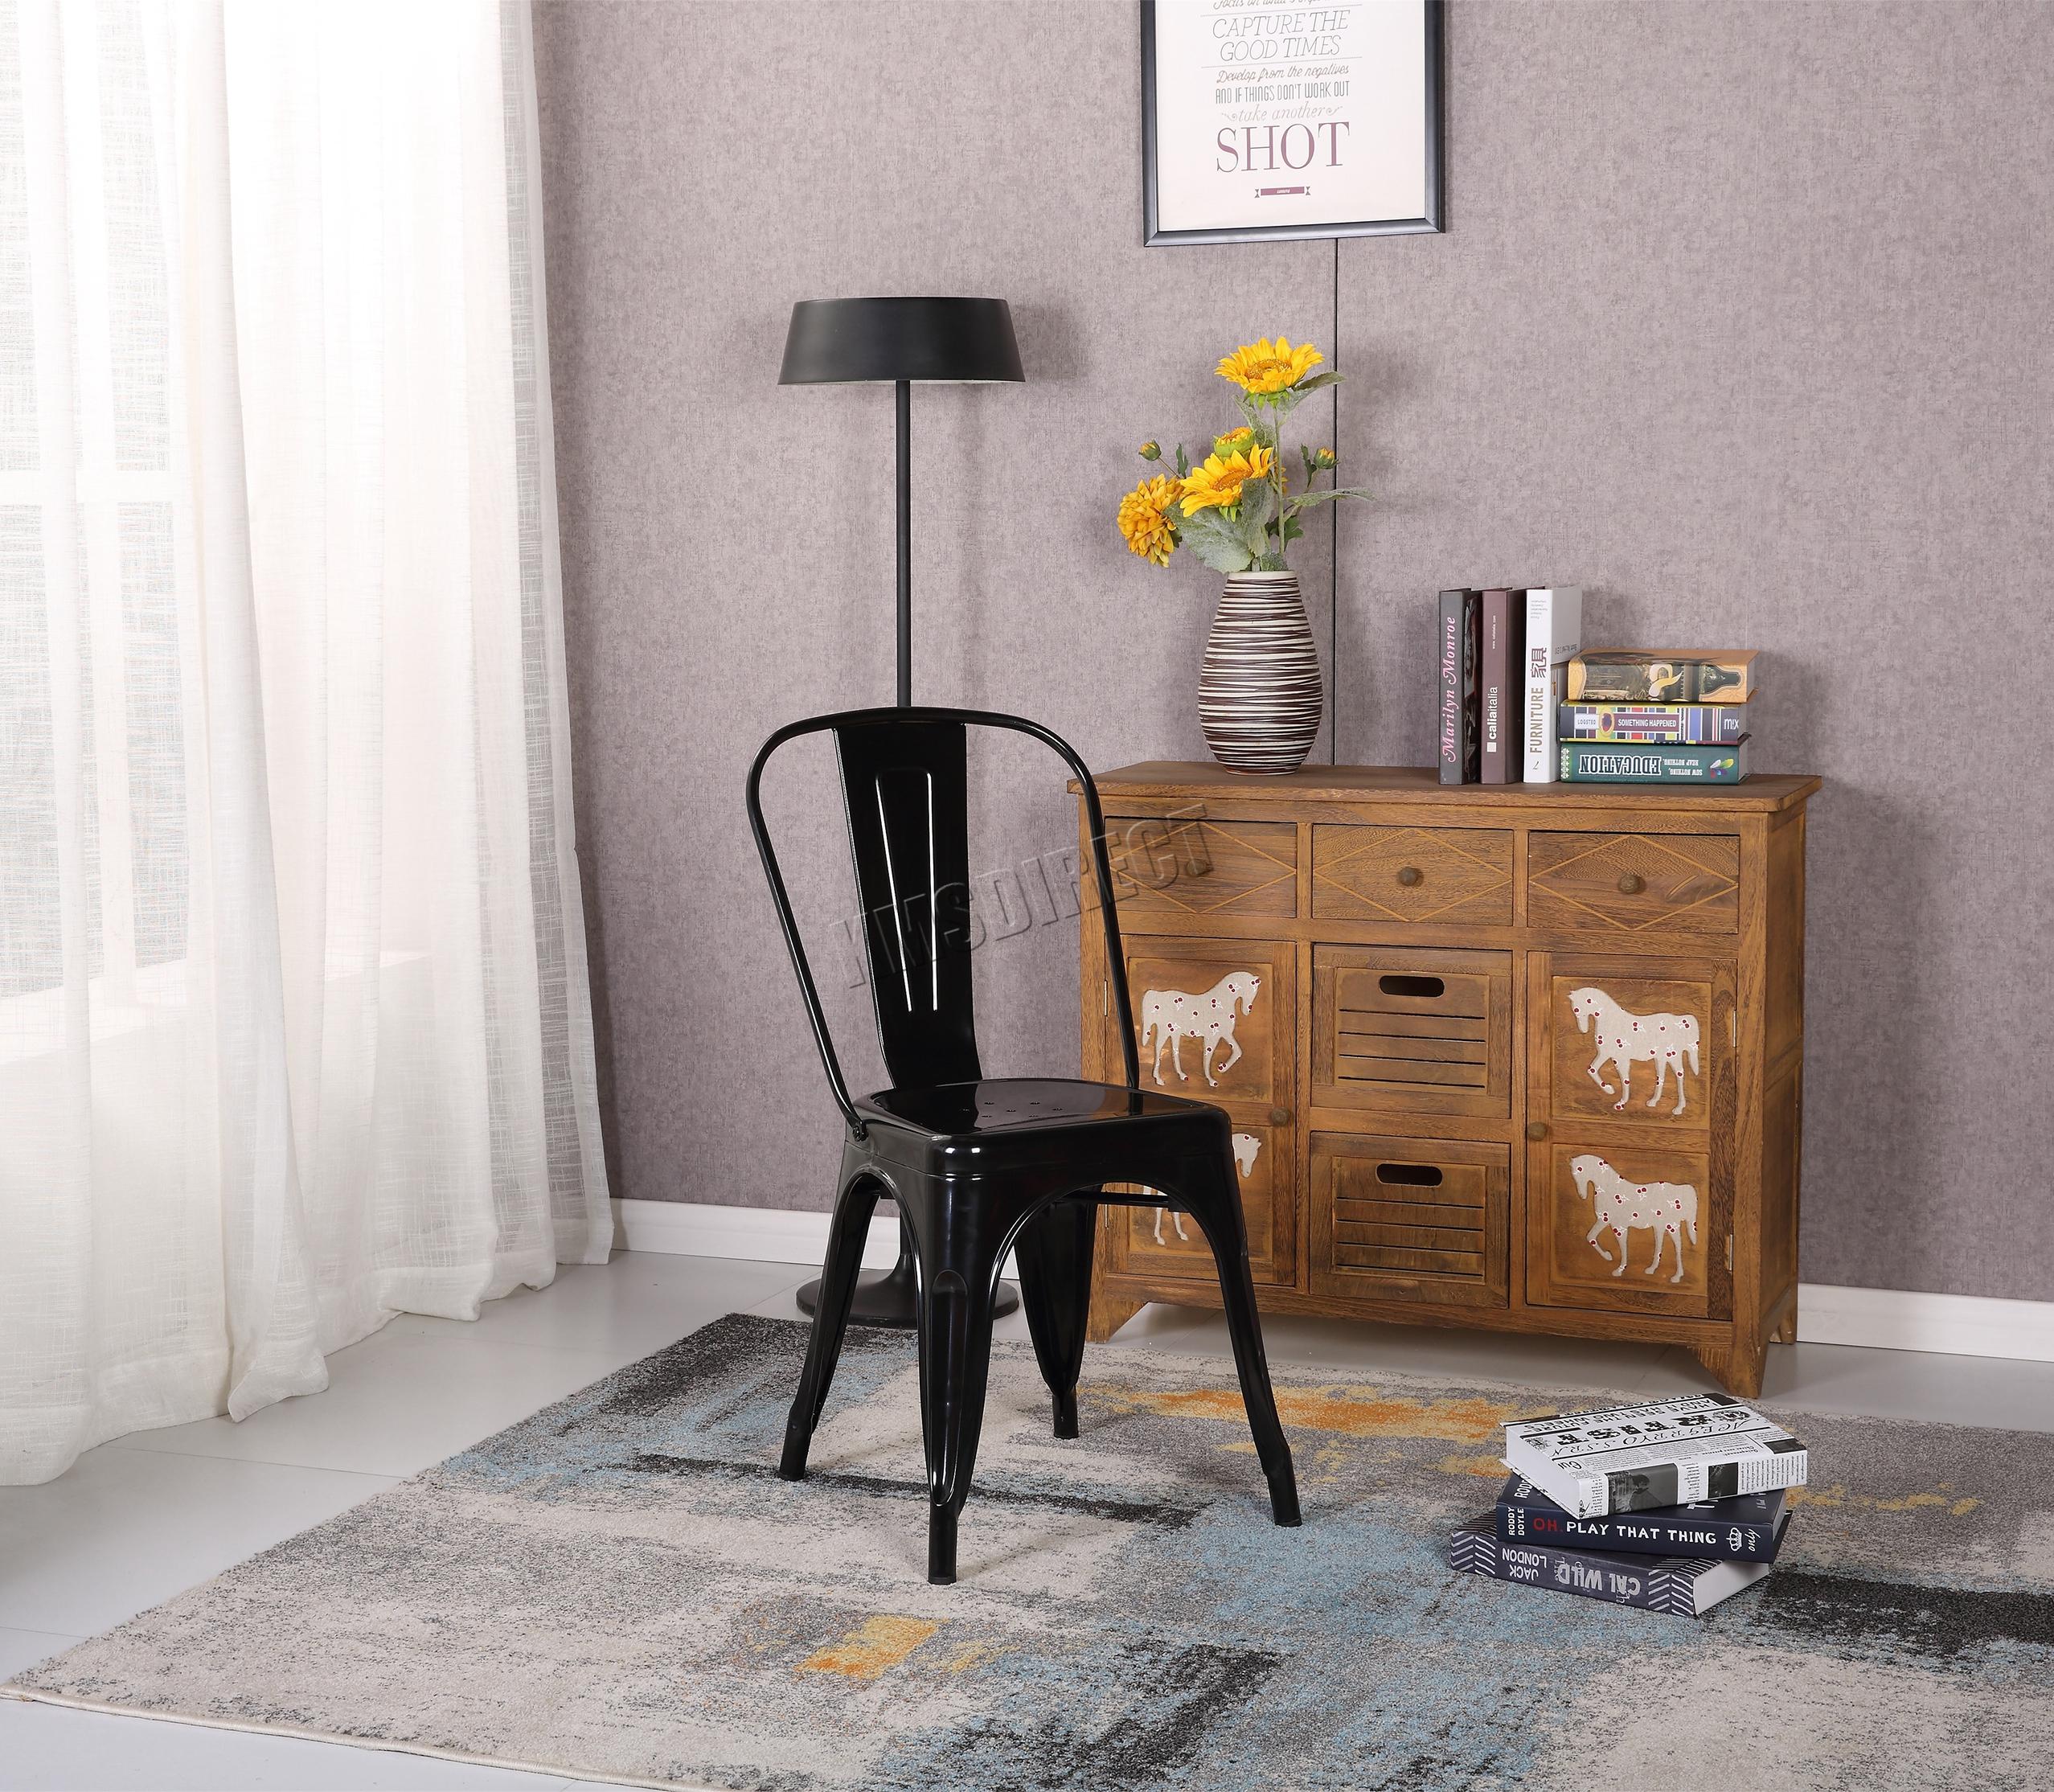 stool pair itm bar retro bistro var tolix metal chair dining chairs westwood vintage